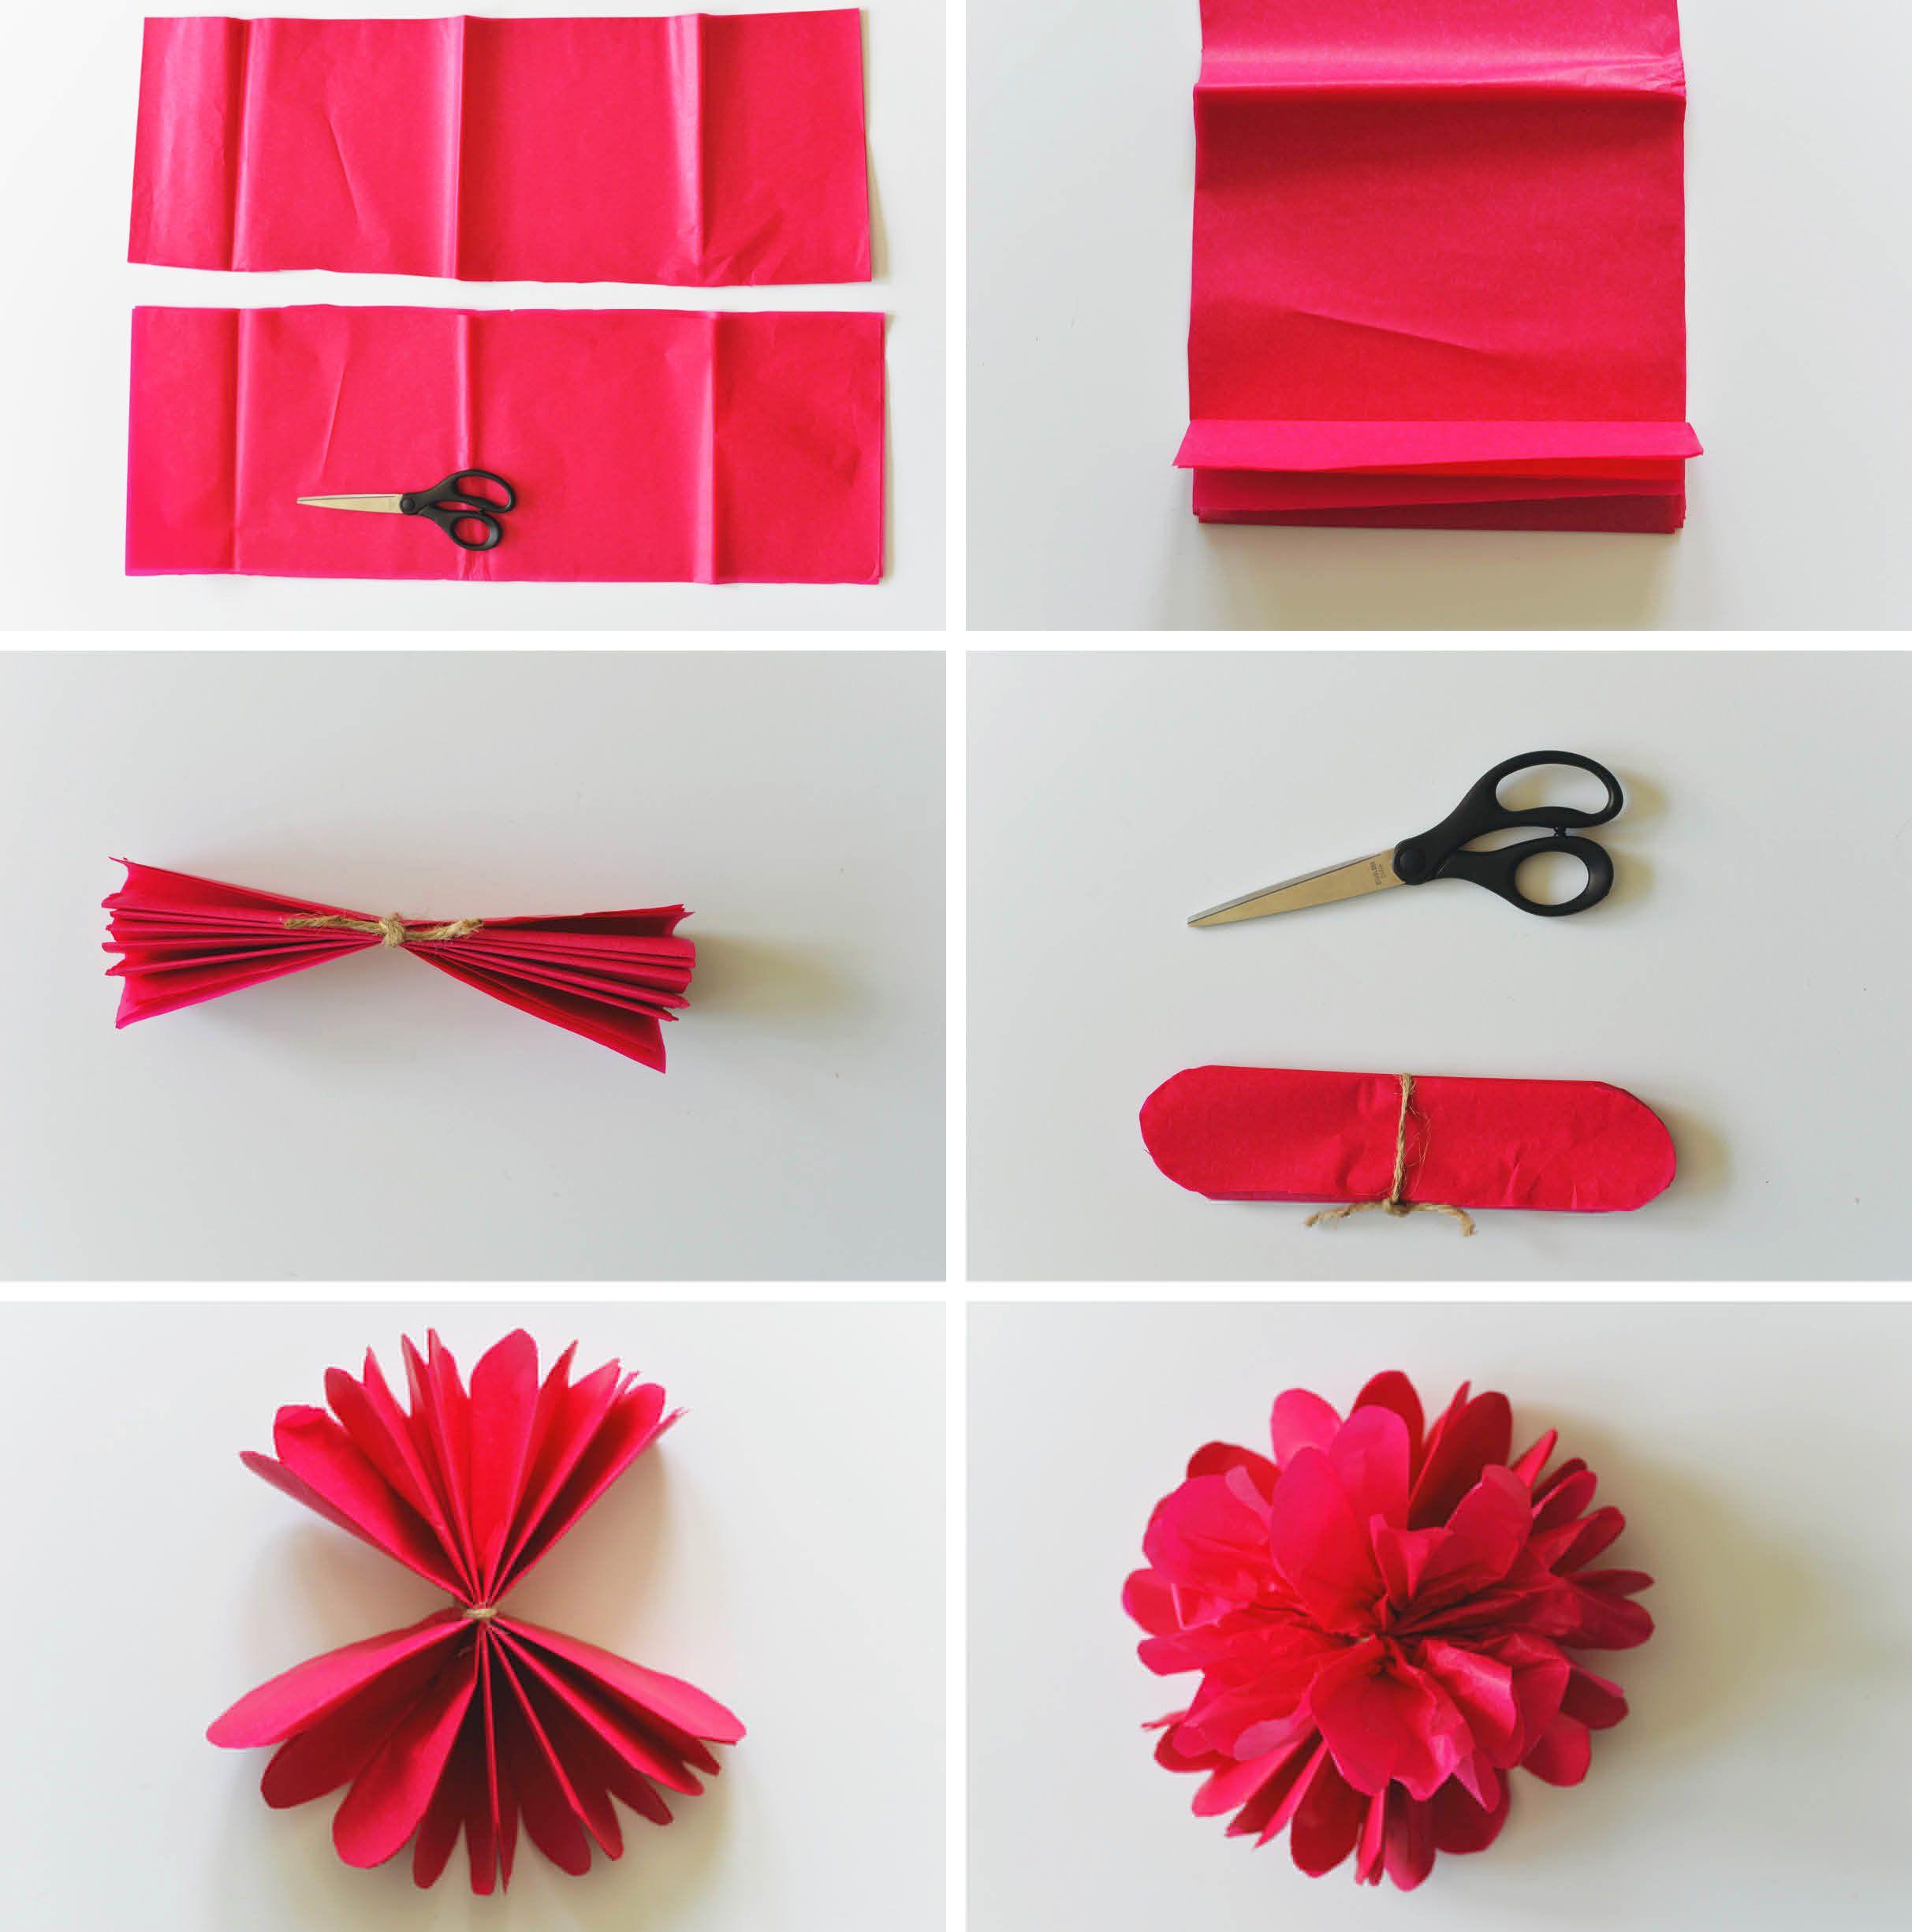 Diy Tissue Paper Flower Backdrop Diy Home Decor Diy Crafts Diy Clothes Diy Furniture Diy Wa In 2020 Tissue Paper Flowers Tissue Paper Flowers Diy Paper Flowers Diy